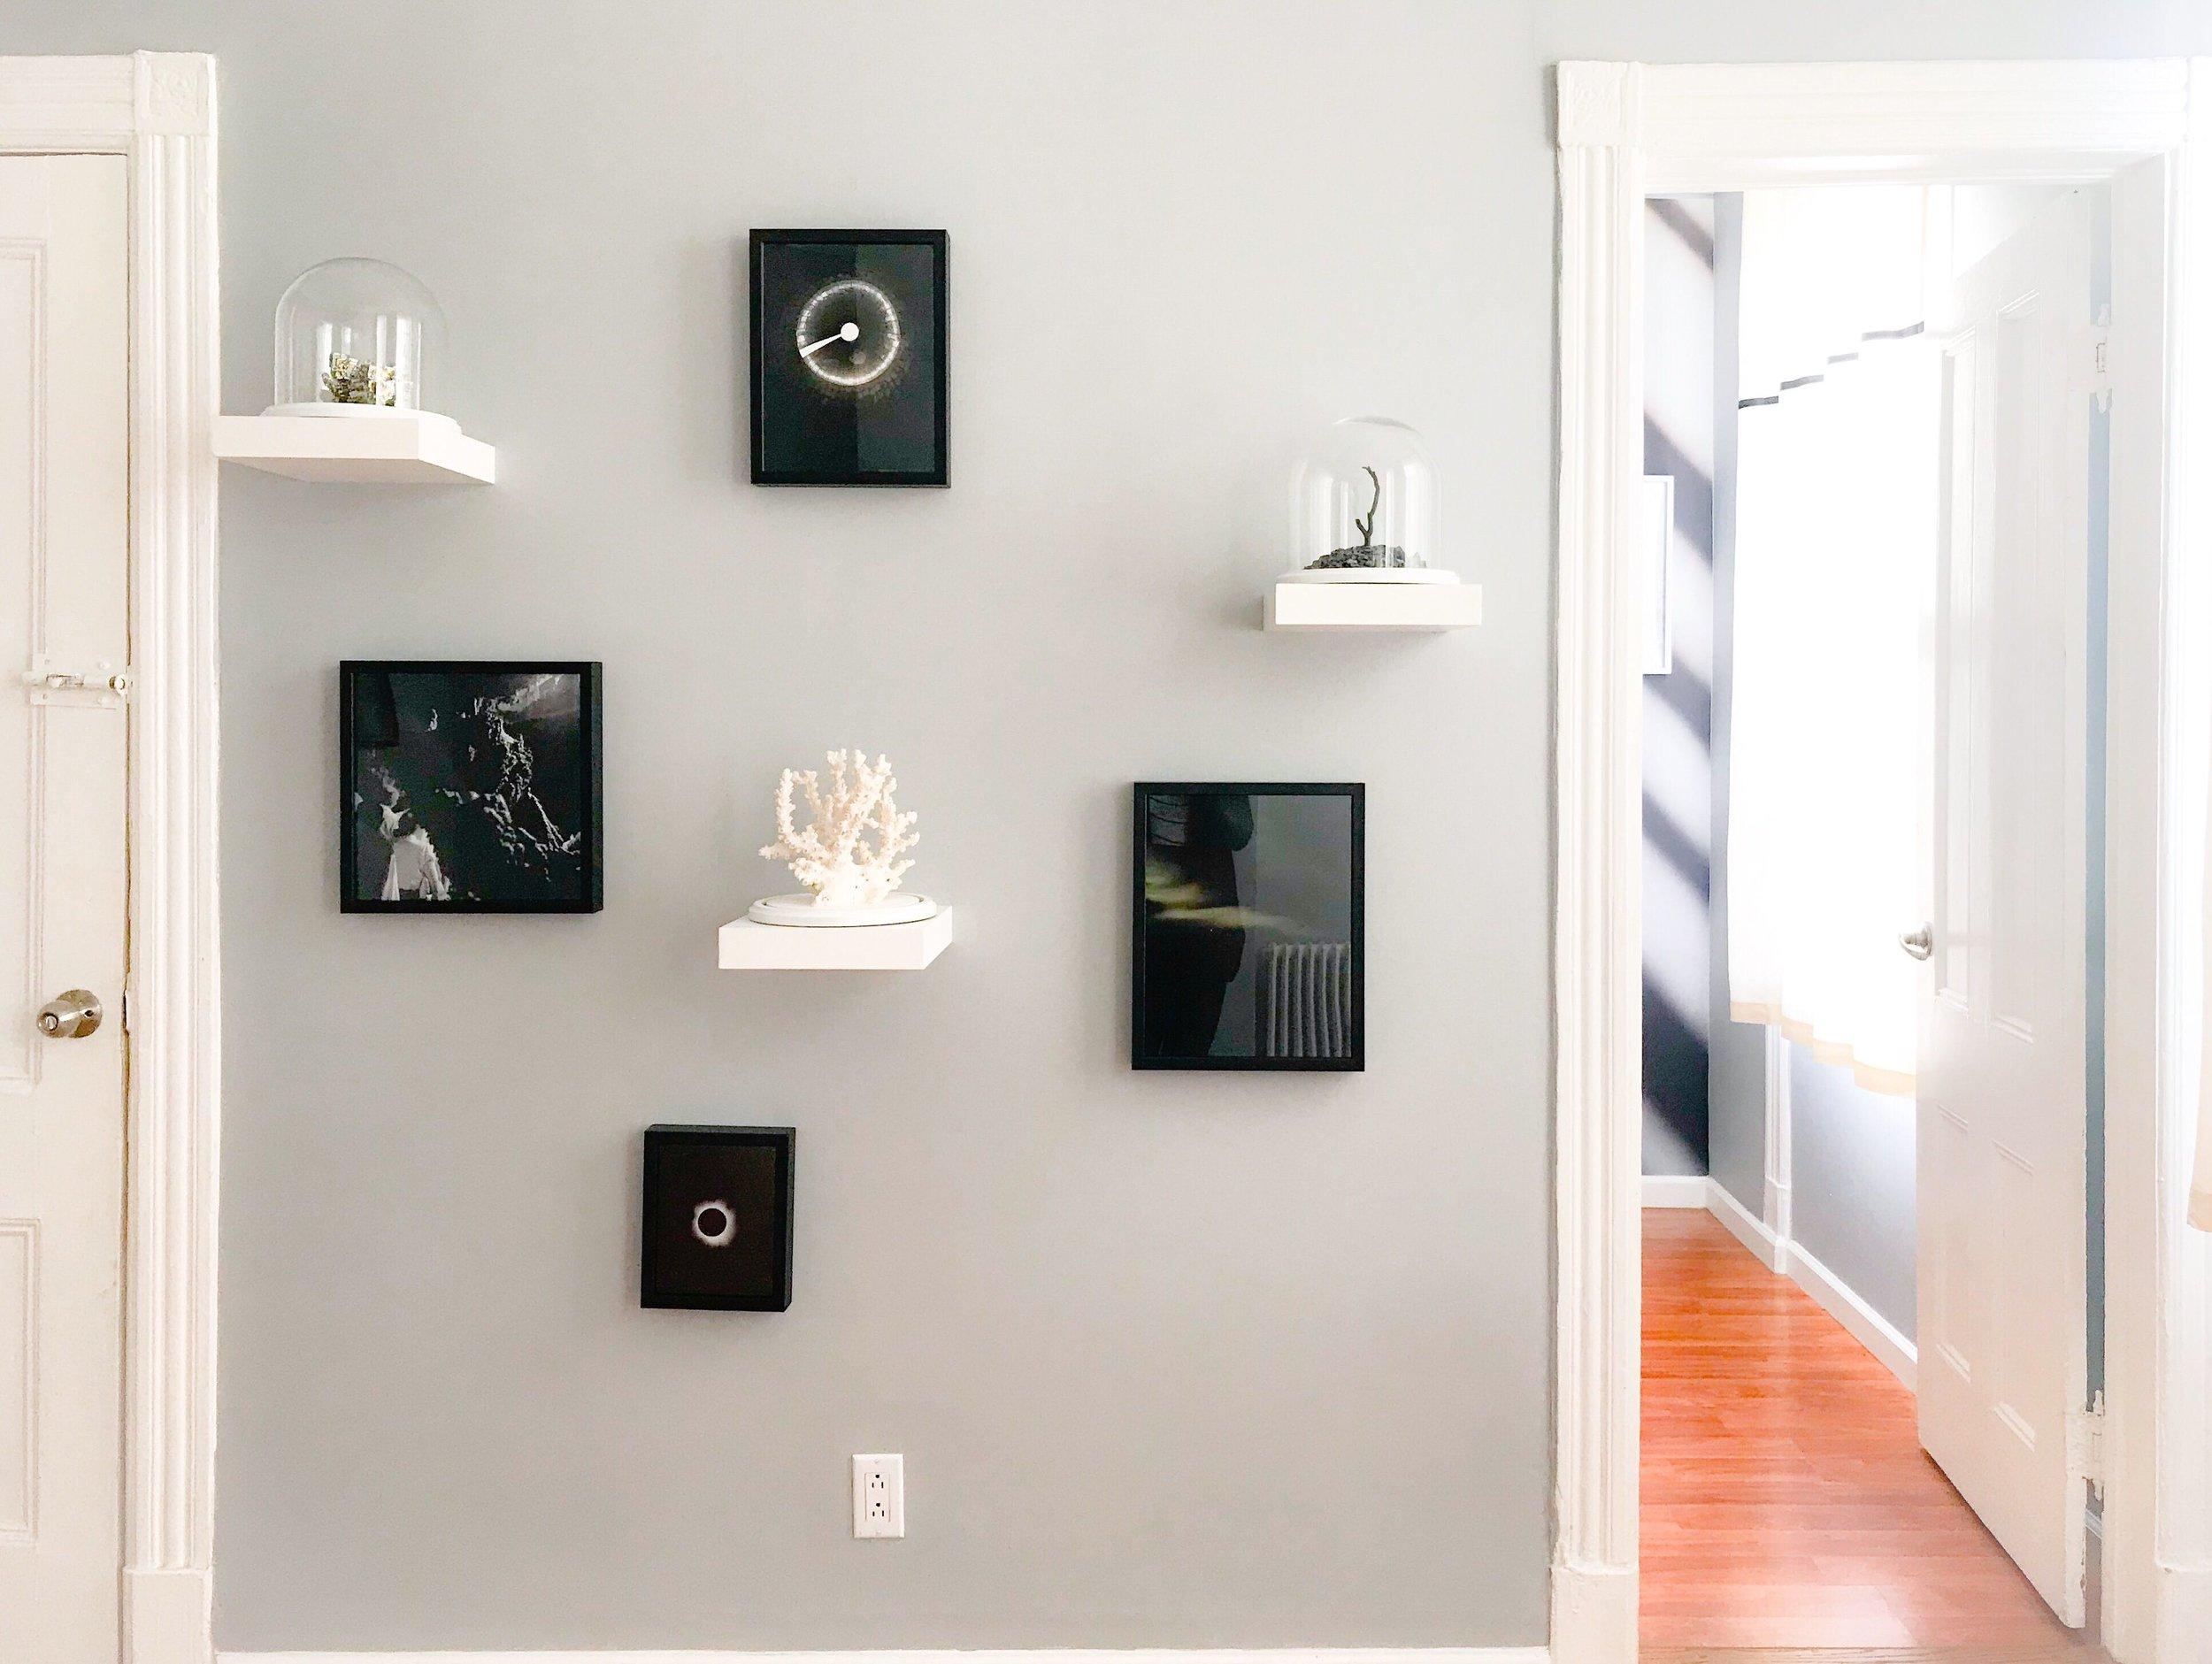 Specimen Wall.JPEG